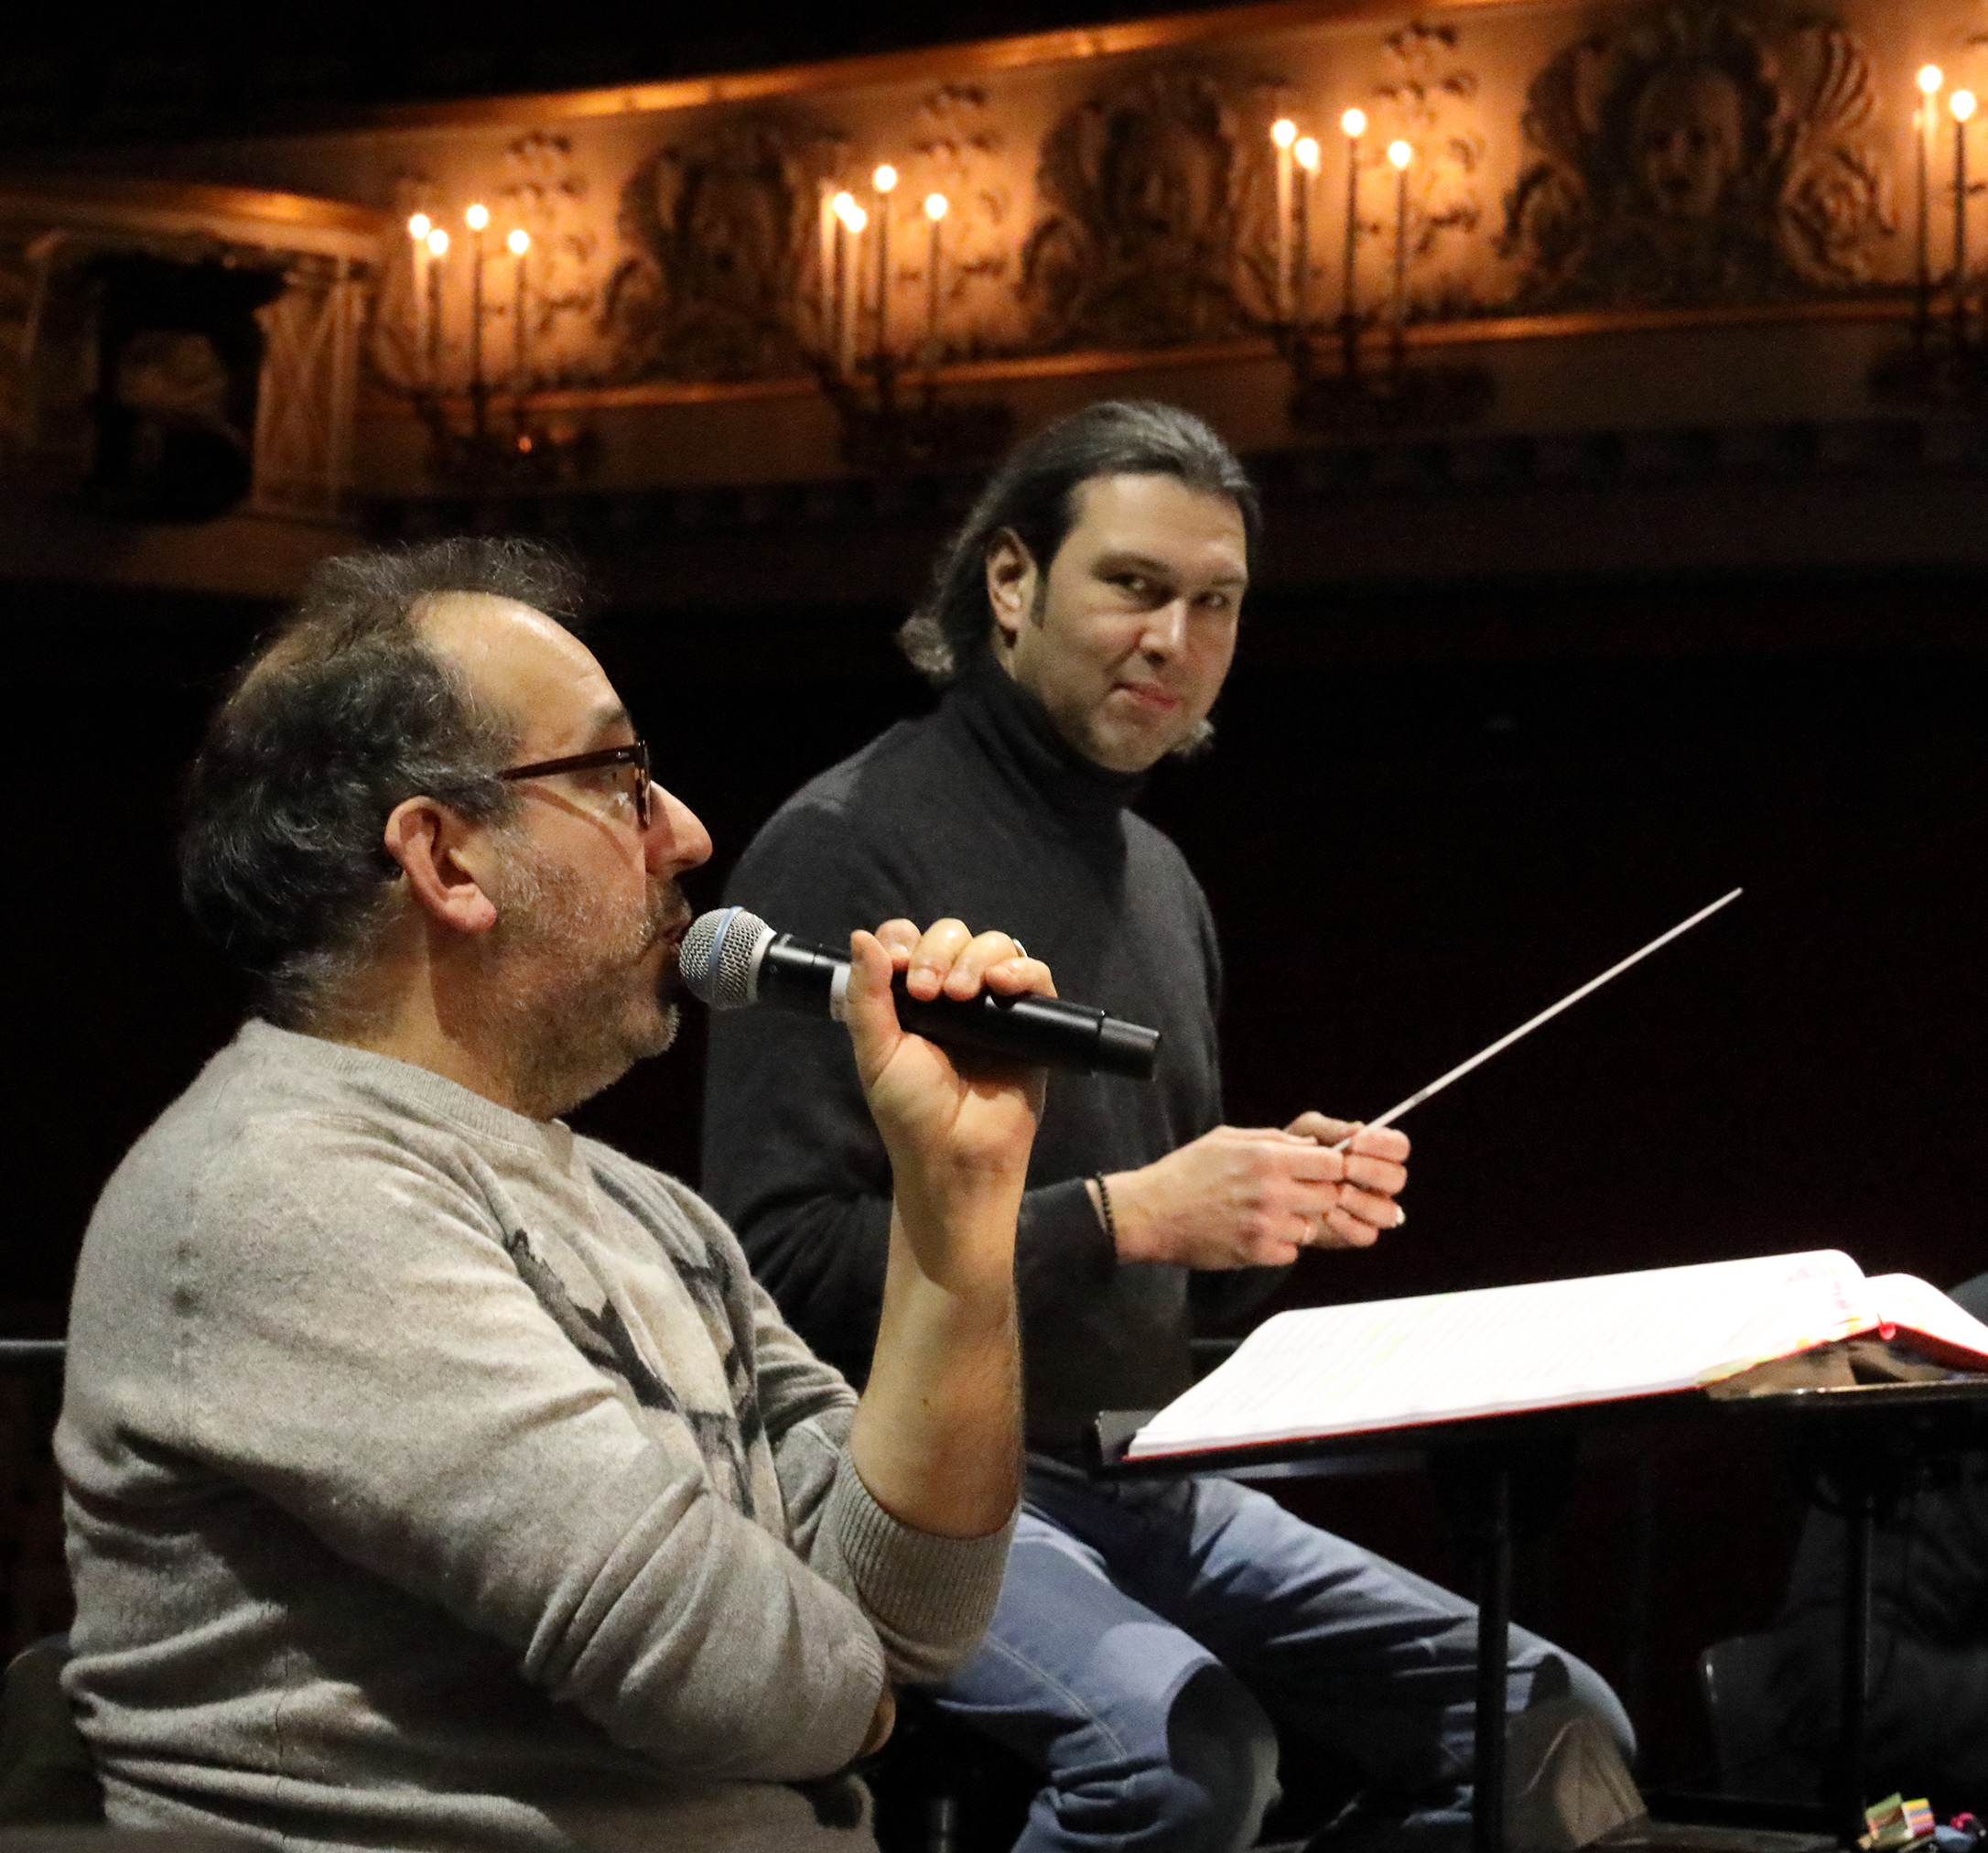 Jurowski, Kosky, rehearsal, probe, Munich, Bayerische Staatsoper, Der Rosenkavalier, opera, classical, music